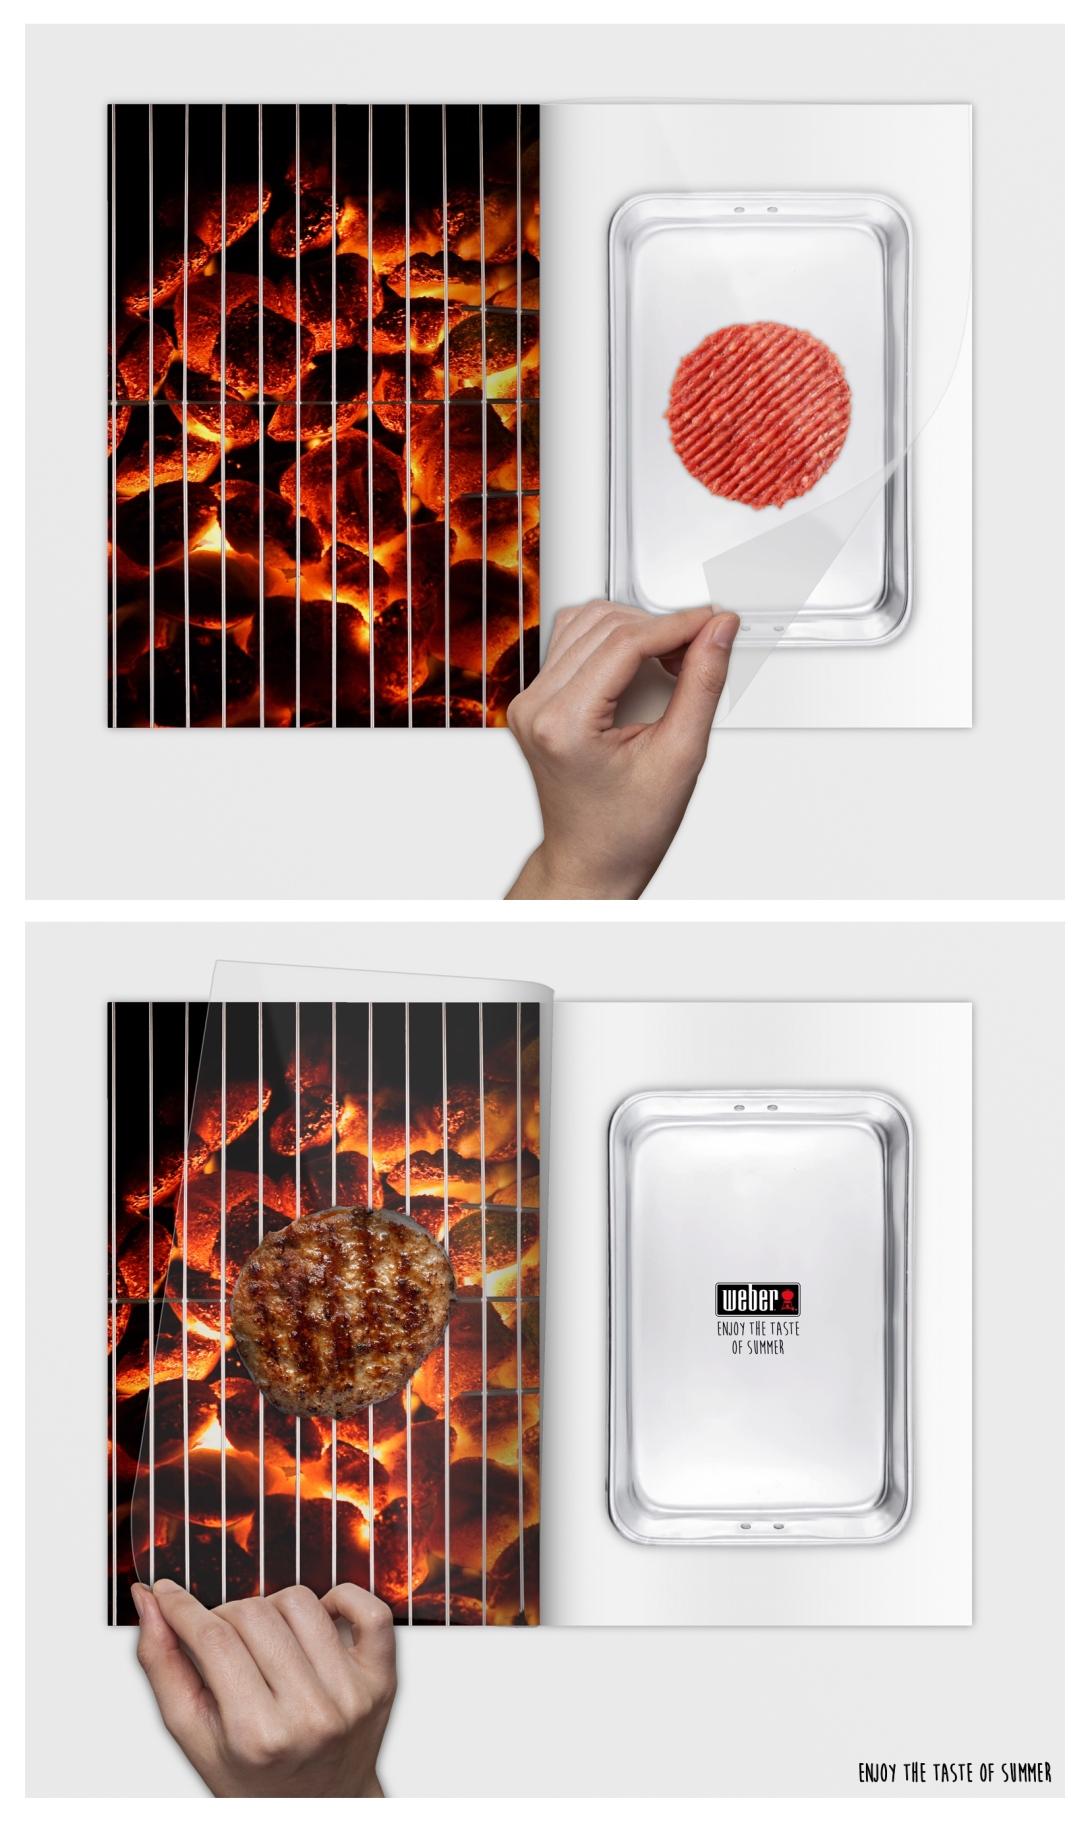 Flip the burger - a magazine spread idea for a BBQ brand